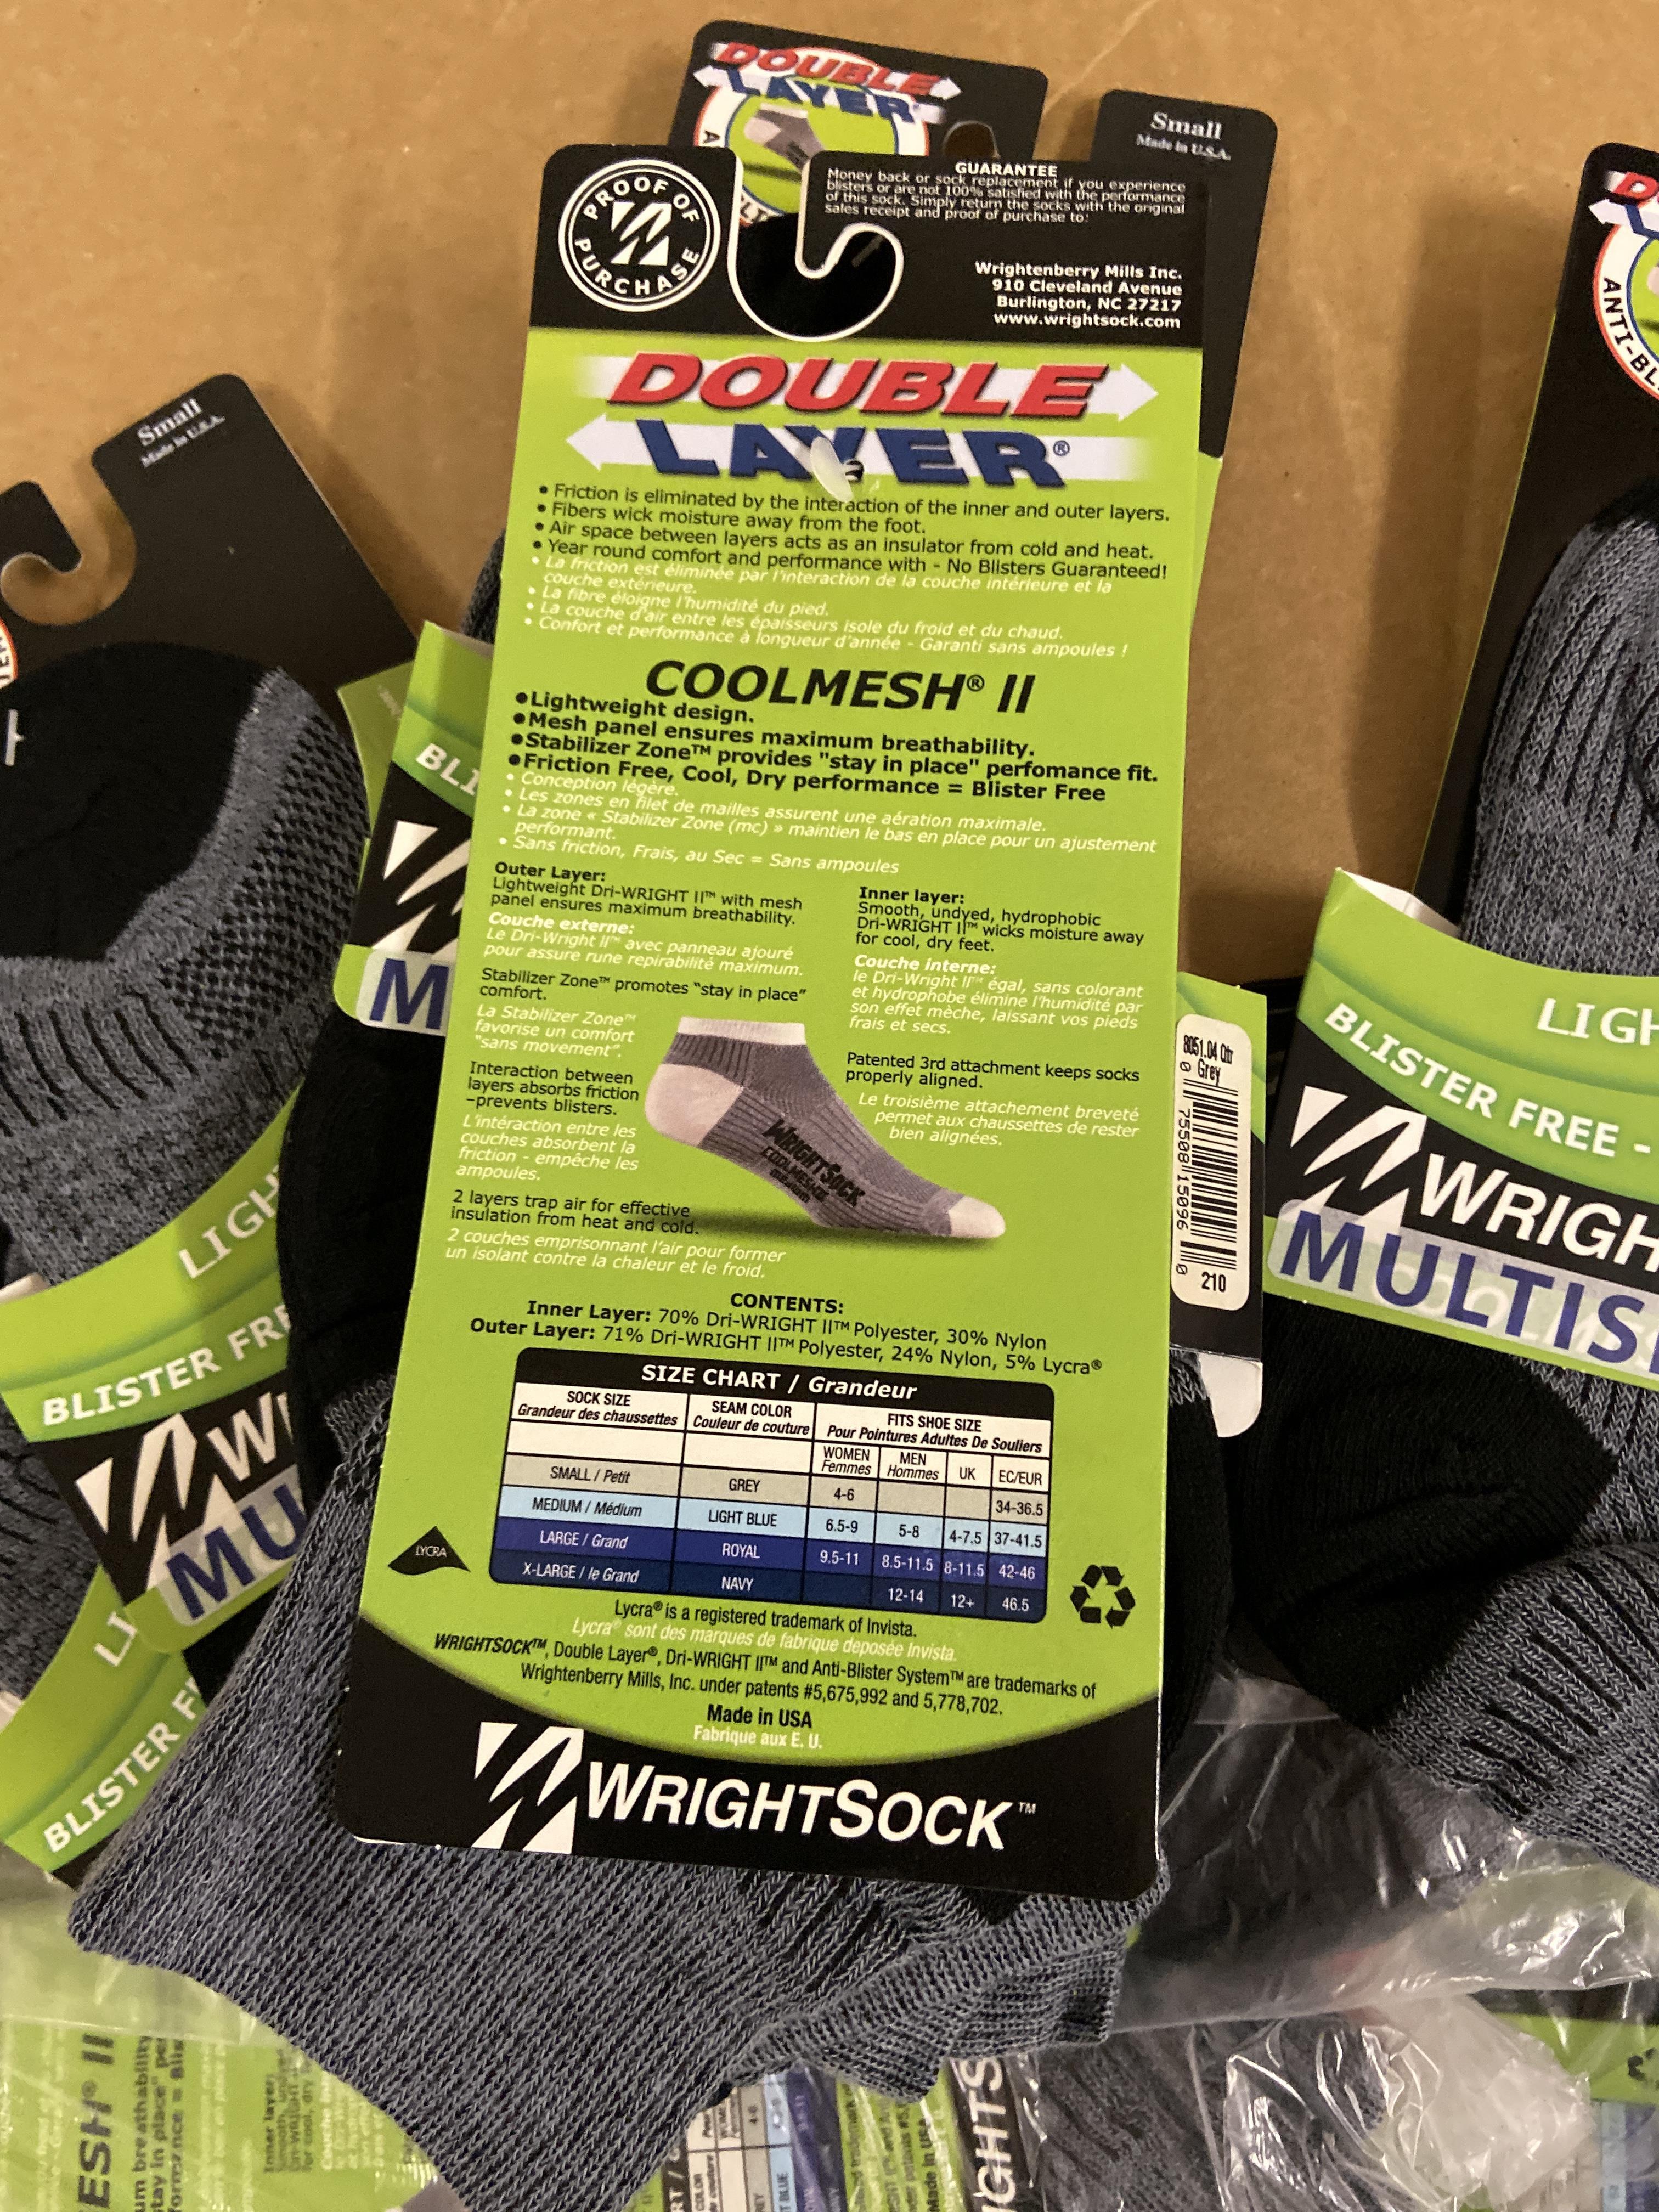 250+ packs of New Socks, Wrightsock Multisport, Double Layer, Gray/Black - Image 3 of 3